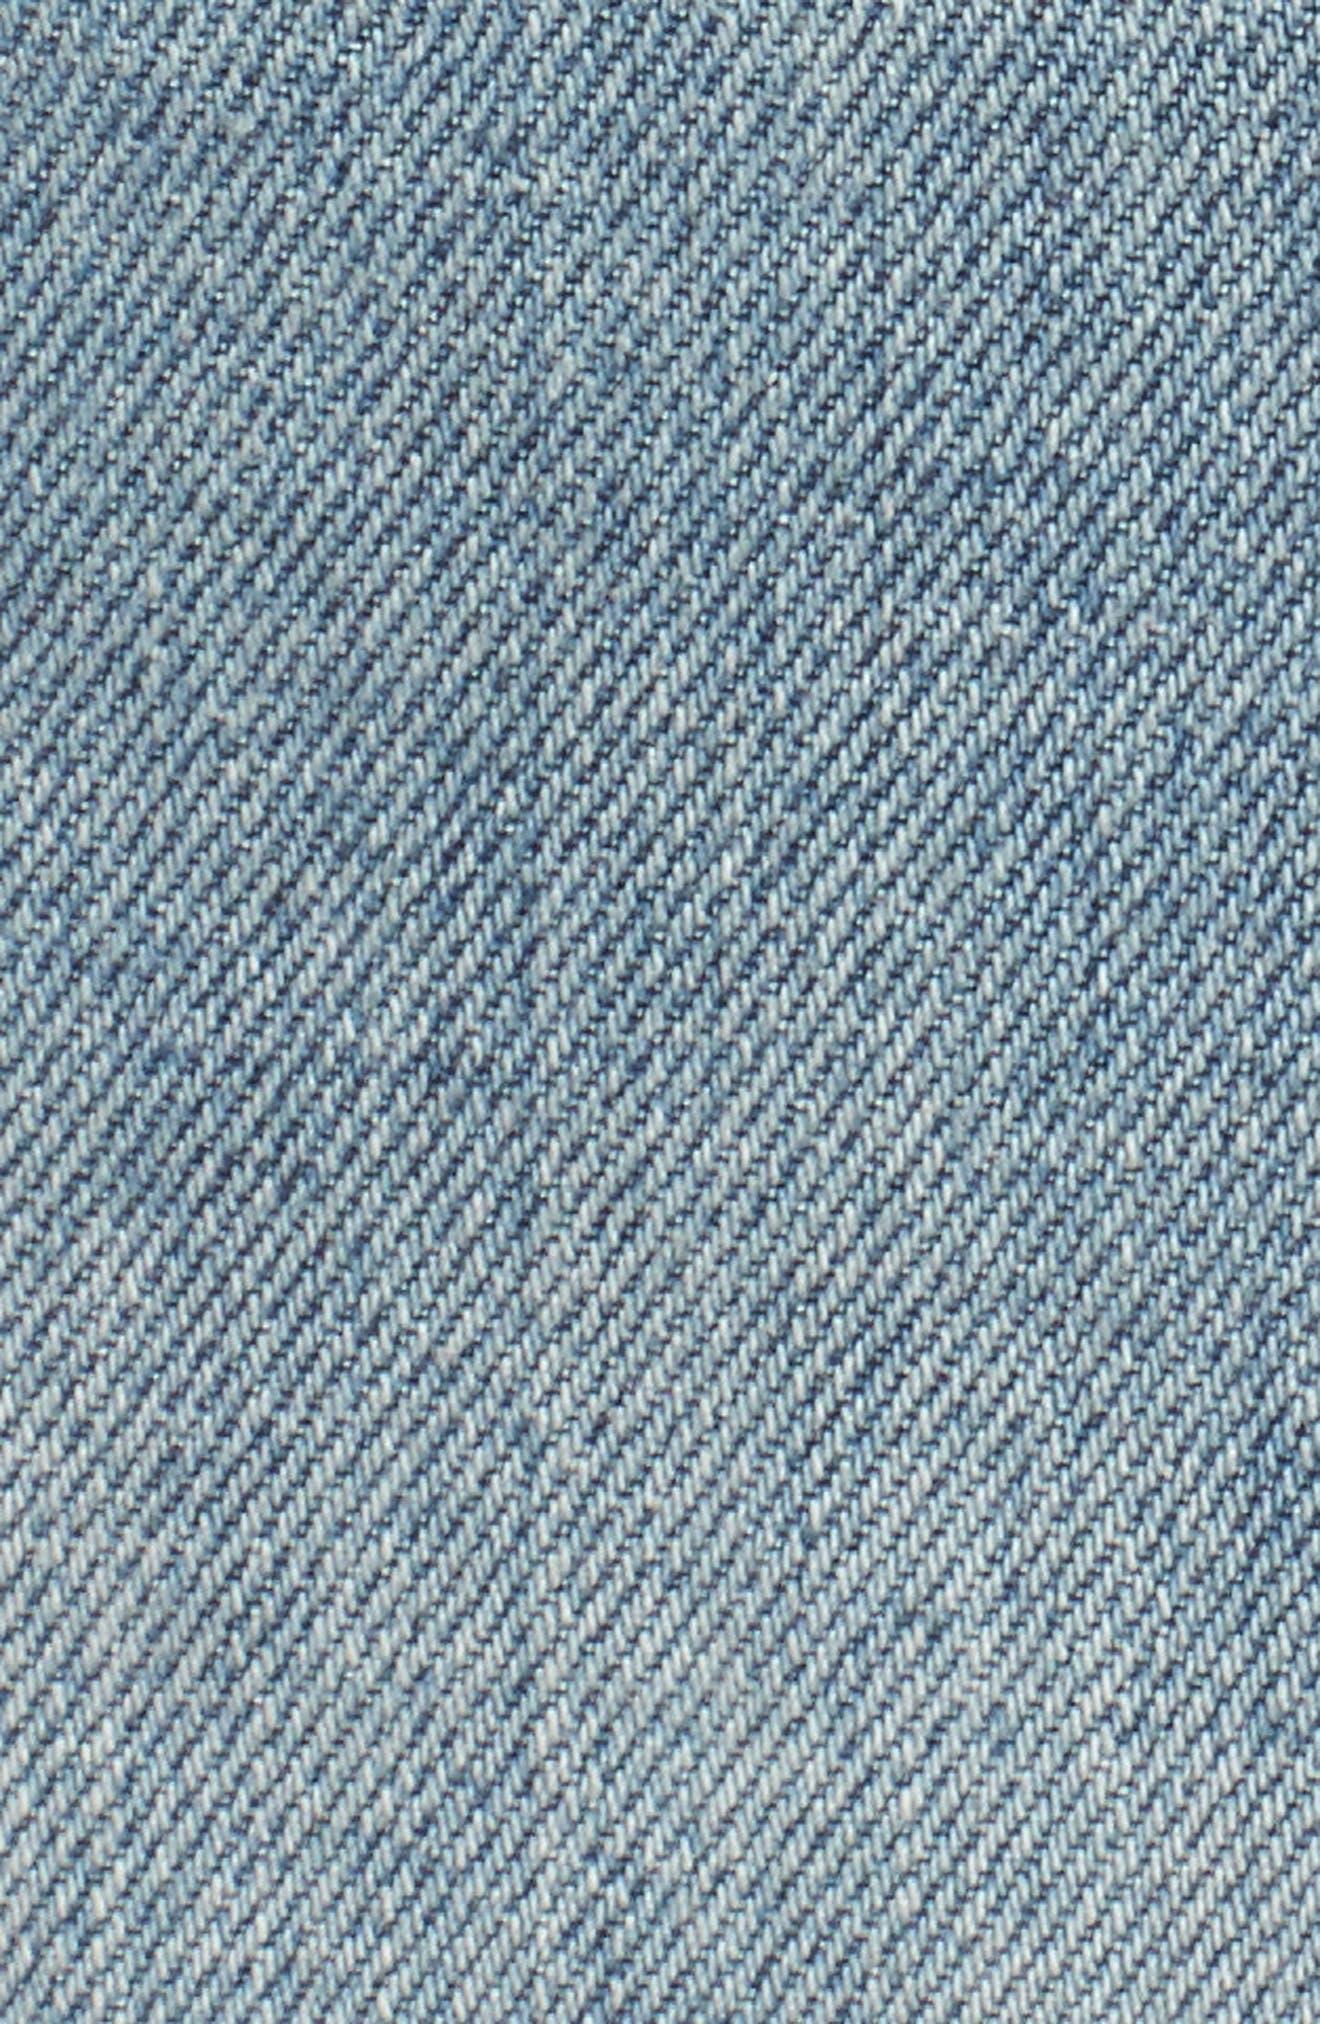 Wynonna Studded Cutoff Denim Miniskirt,                             Alternate thumbnail 6, color,                             MED VINTAGE ALL OVER STUDDED